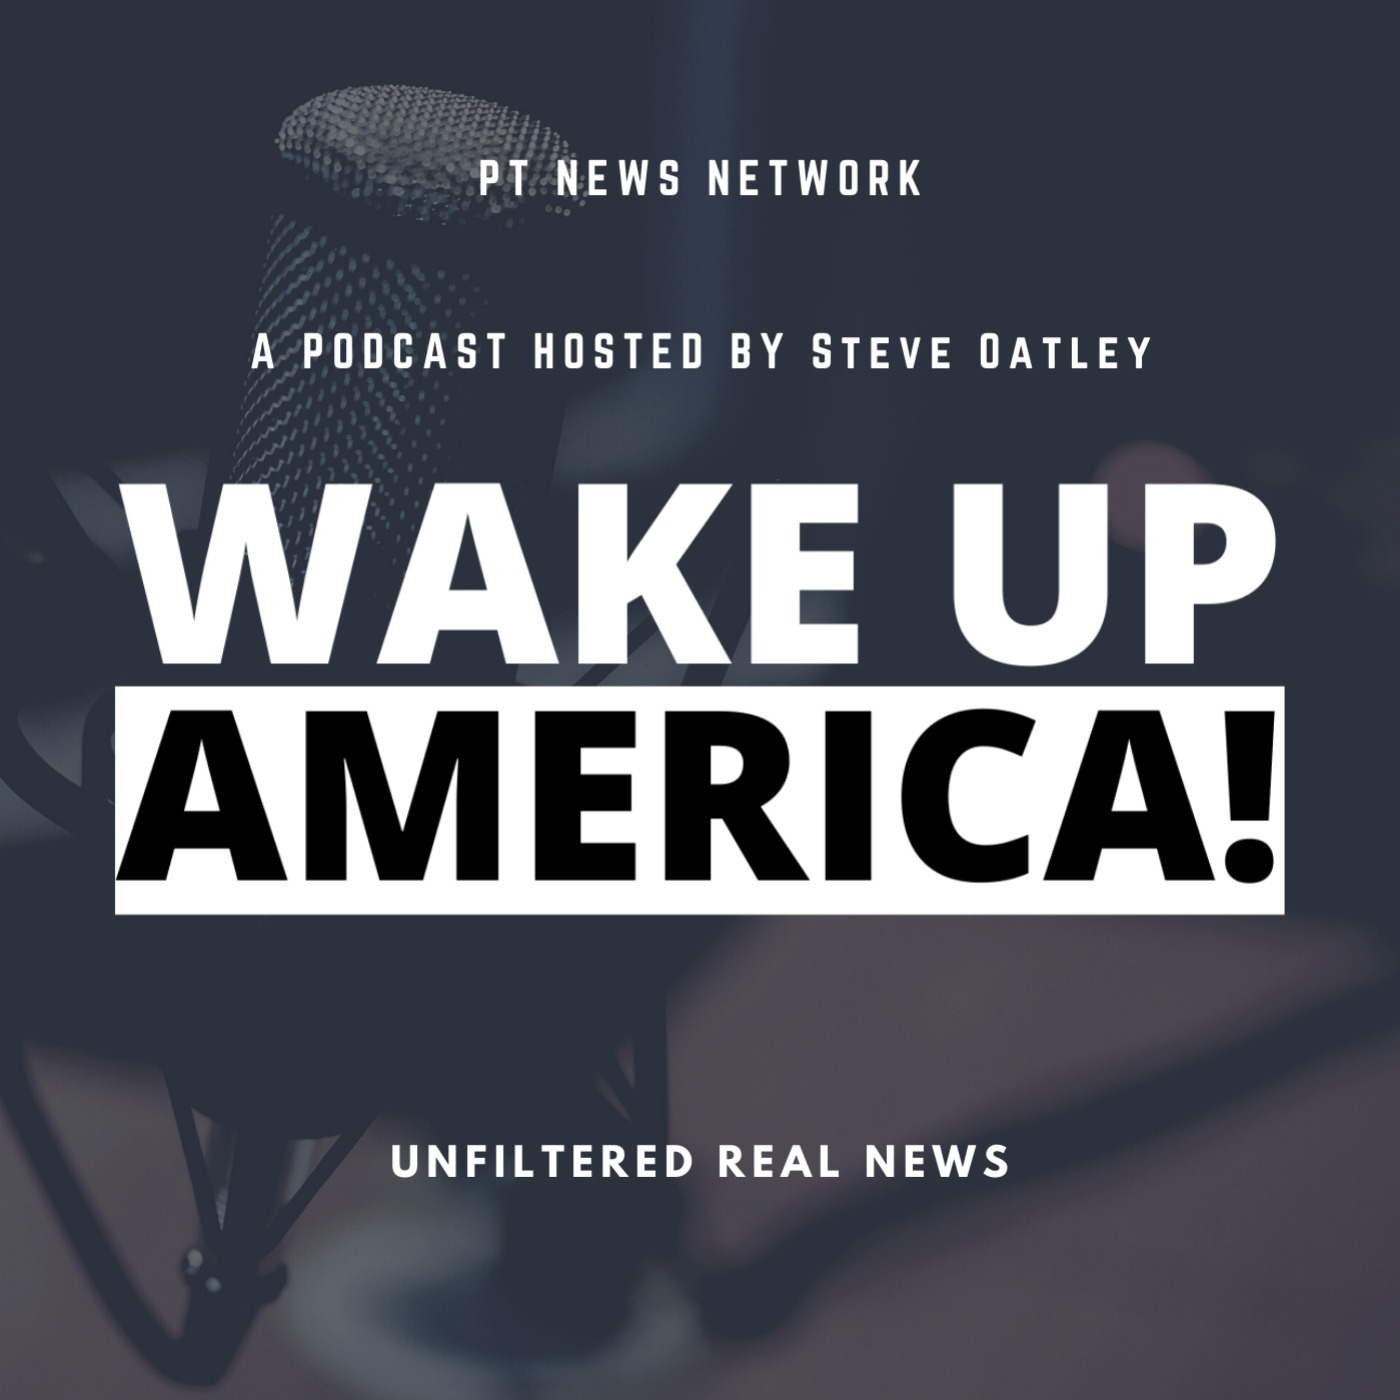 Wake Up America Tuesday 11/17